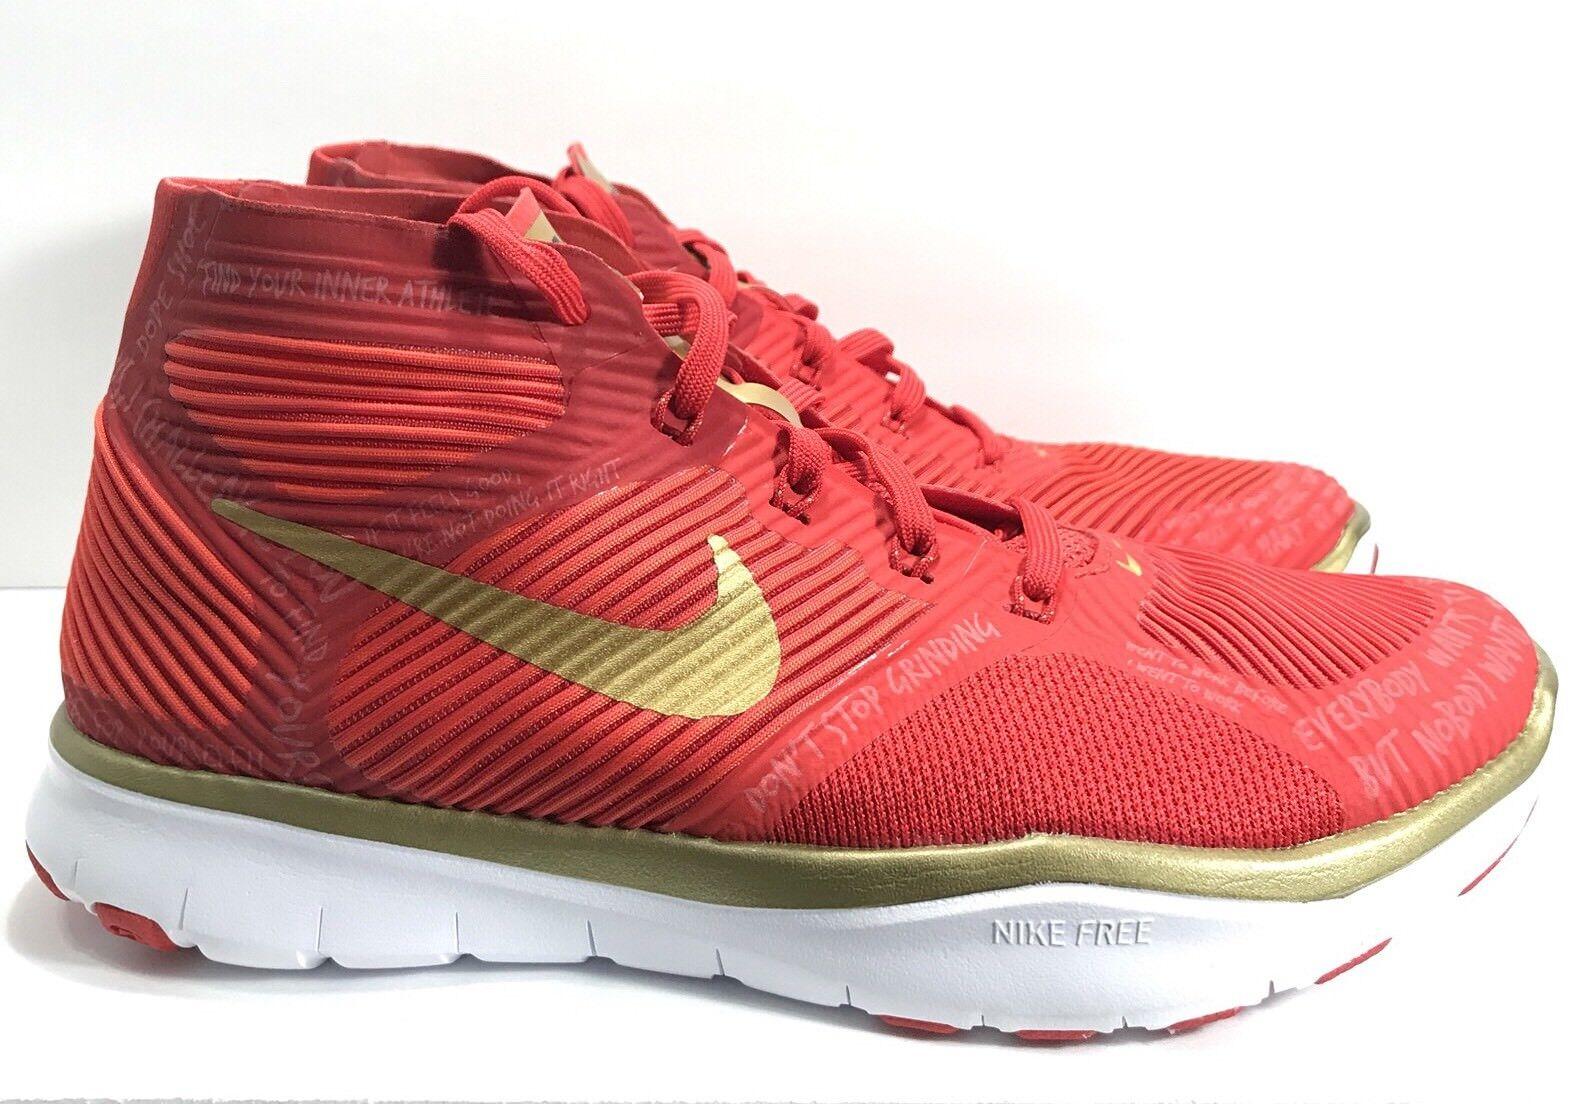 Nike Free Train Instinct Kevin Hart Hustle Men's Shoes Size 6 Red 848416-876